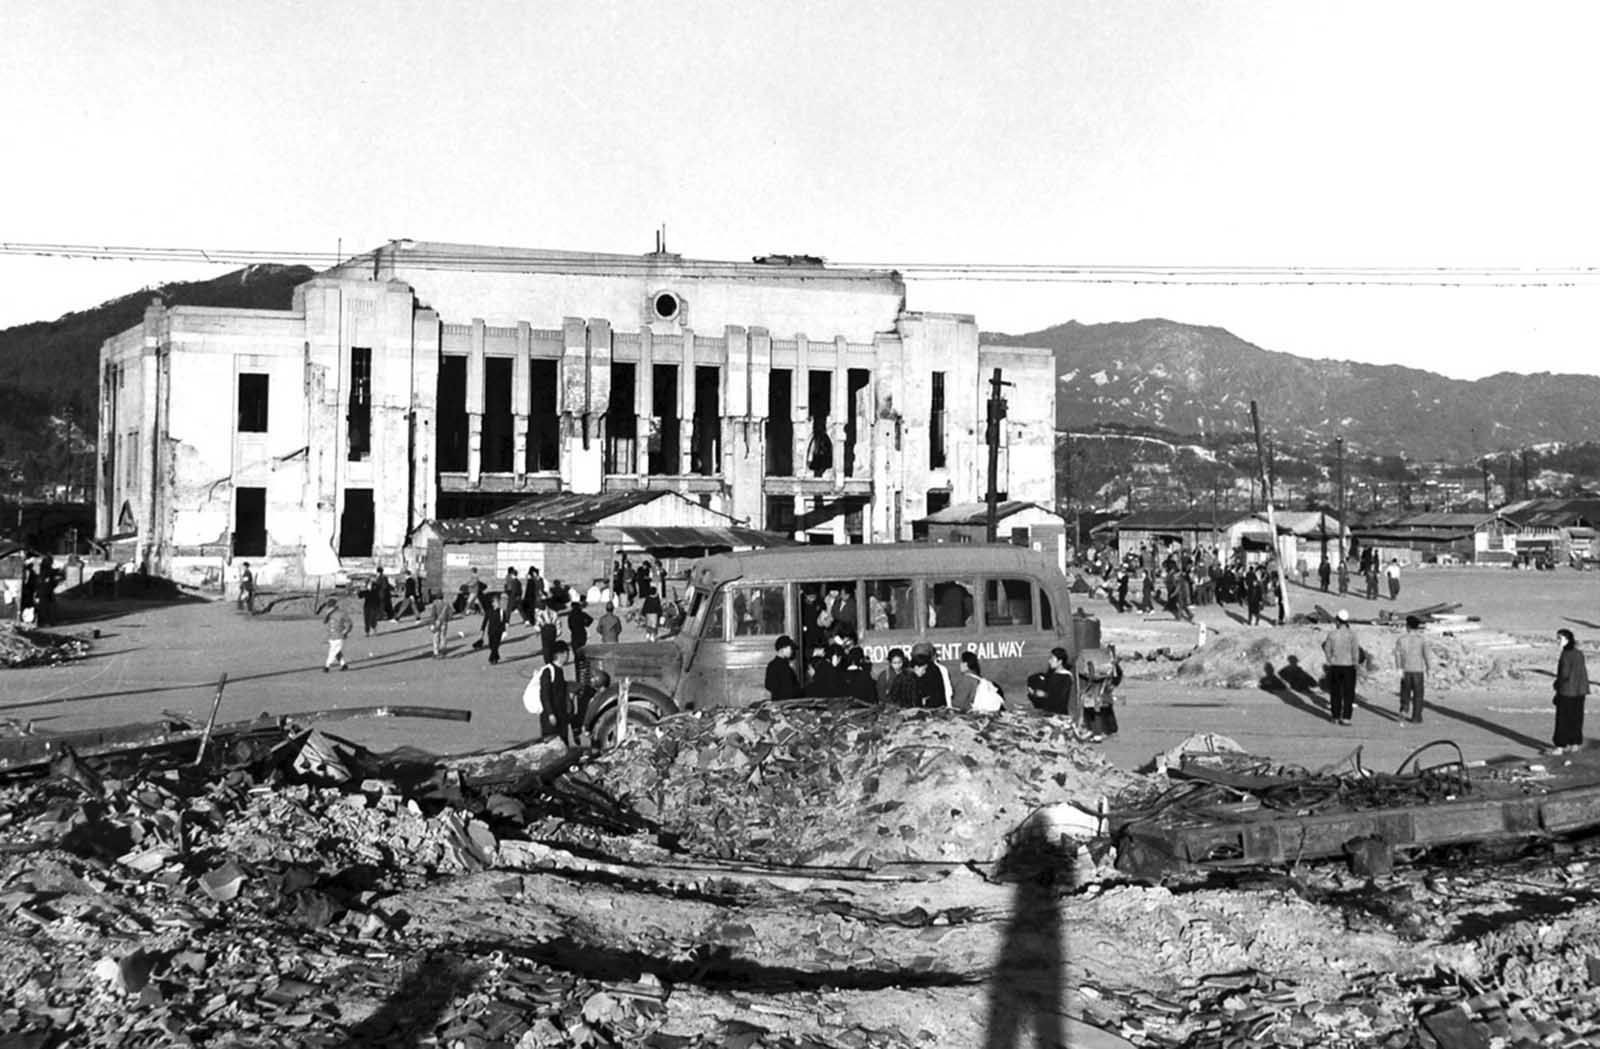 Hiroshima Before And After The Atomic Bombing 1945 Hiroshima